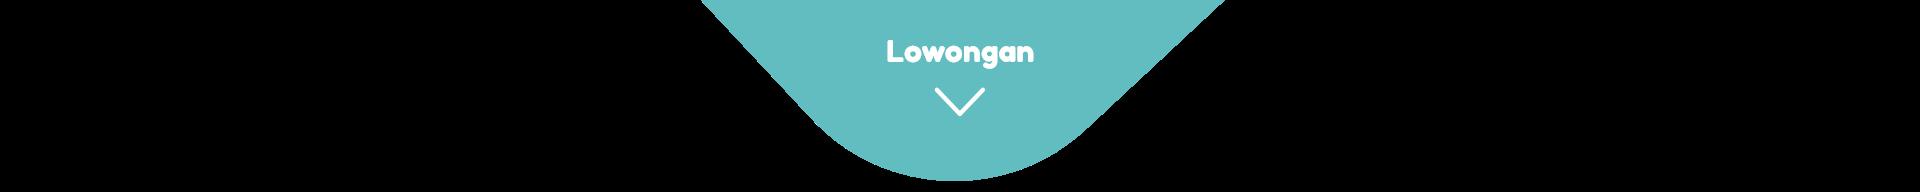 Lowongan Part Time Career Indomaret Group